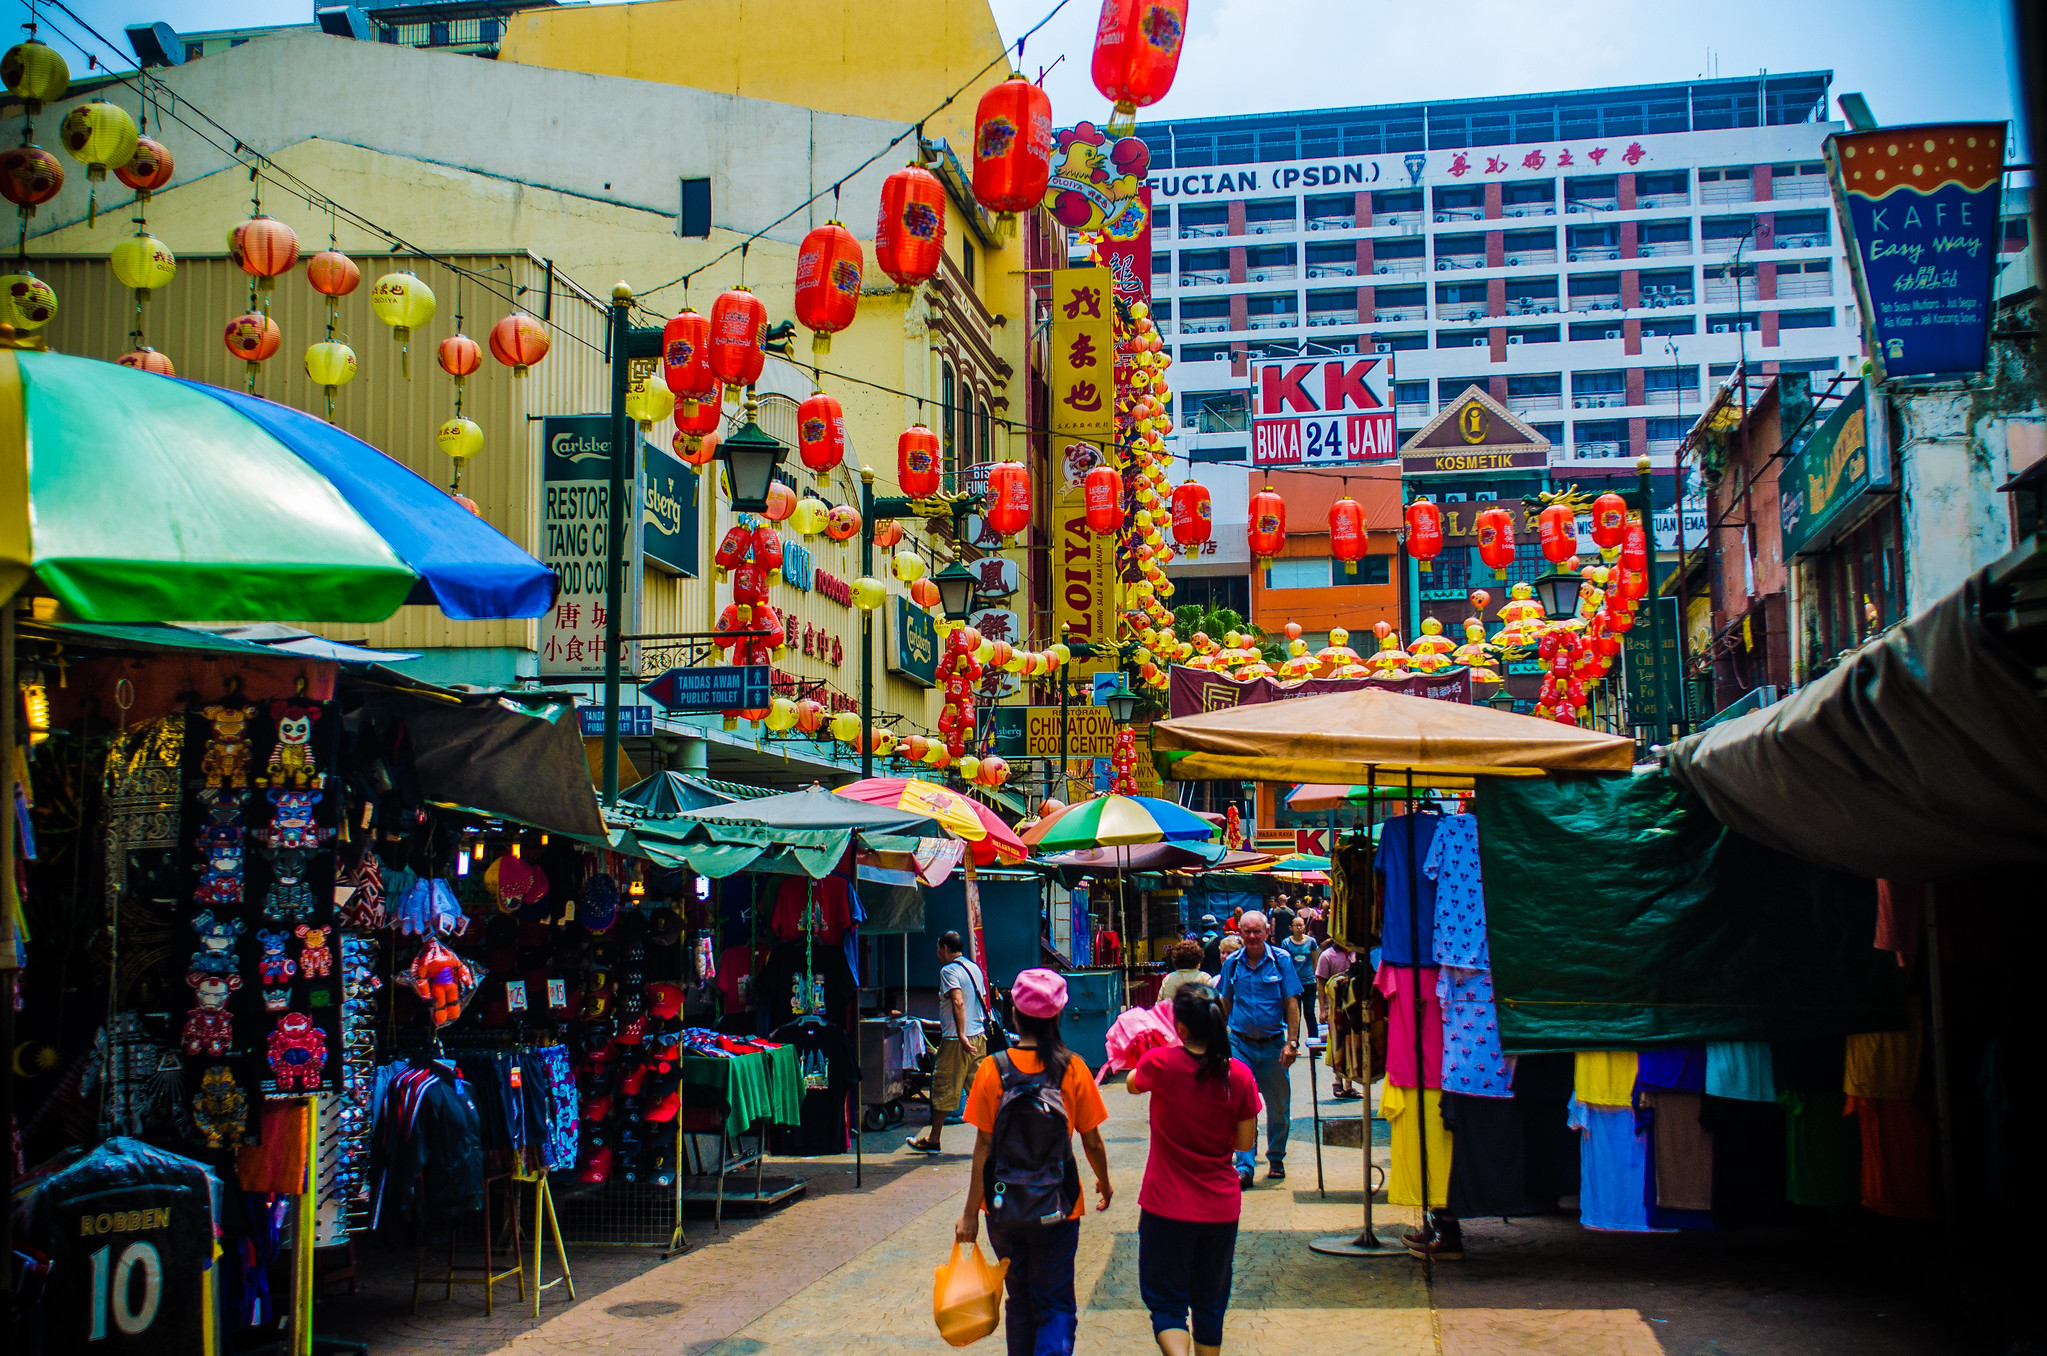 Chinatown Market Kuala Lumpur in Malaysia